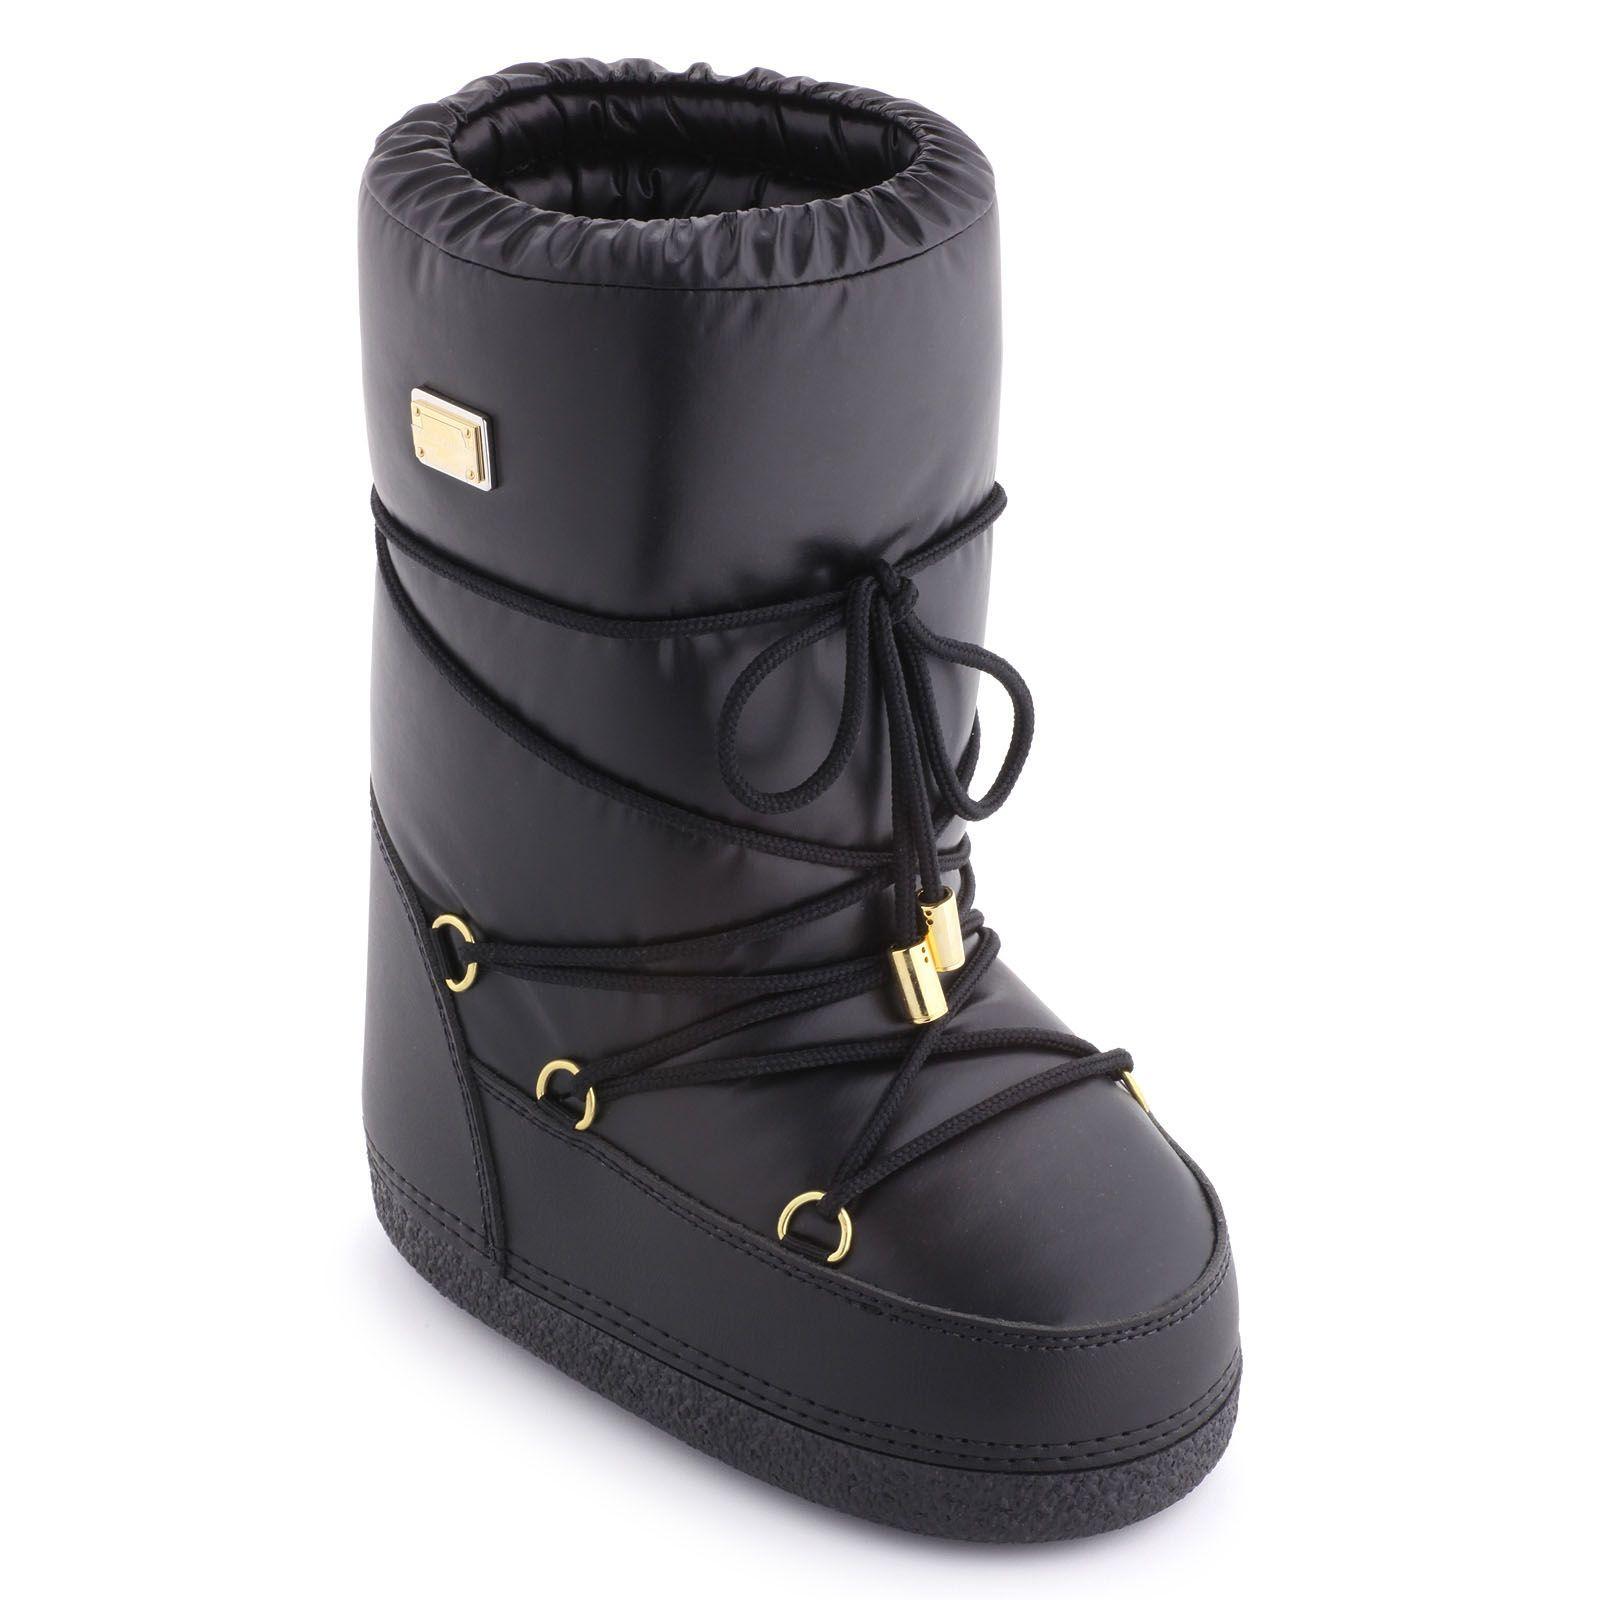 26+ Black snow boots womens ideas ideas